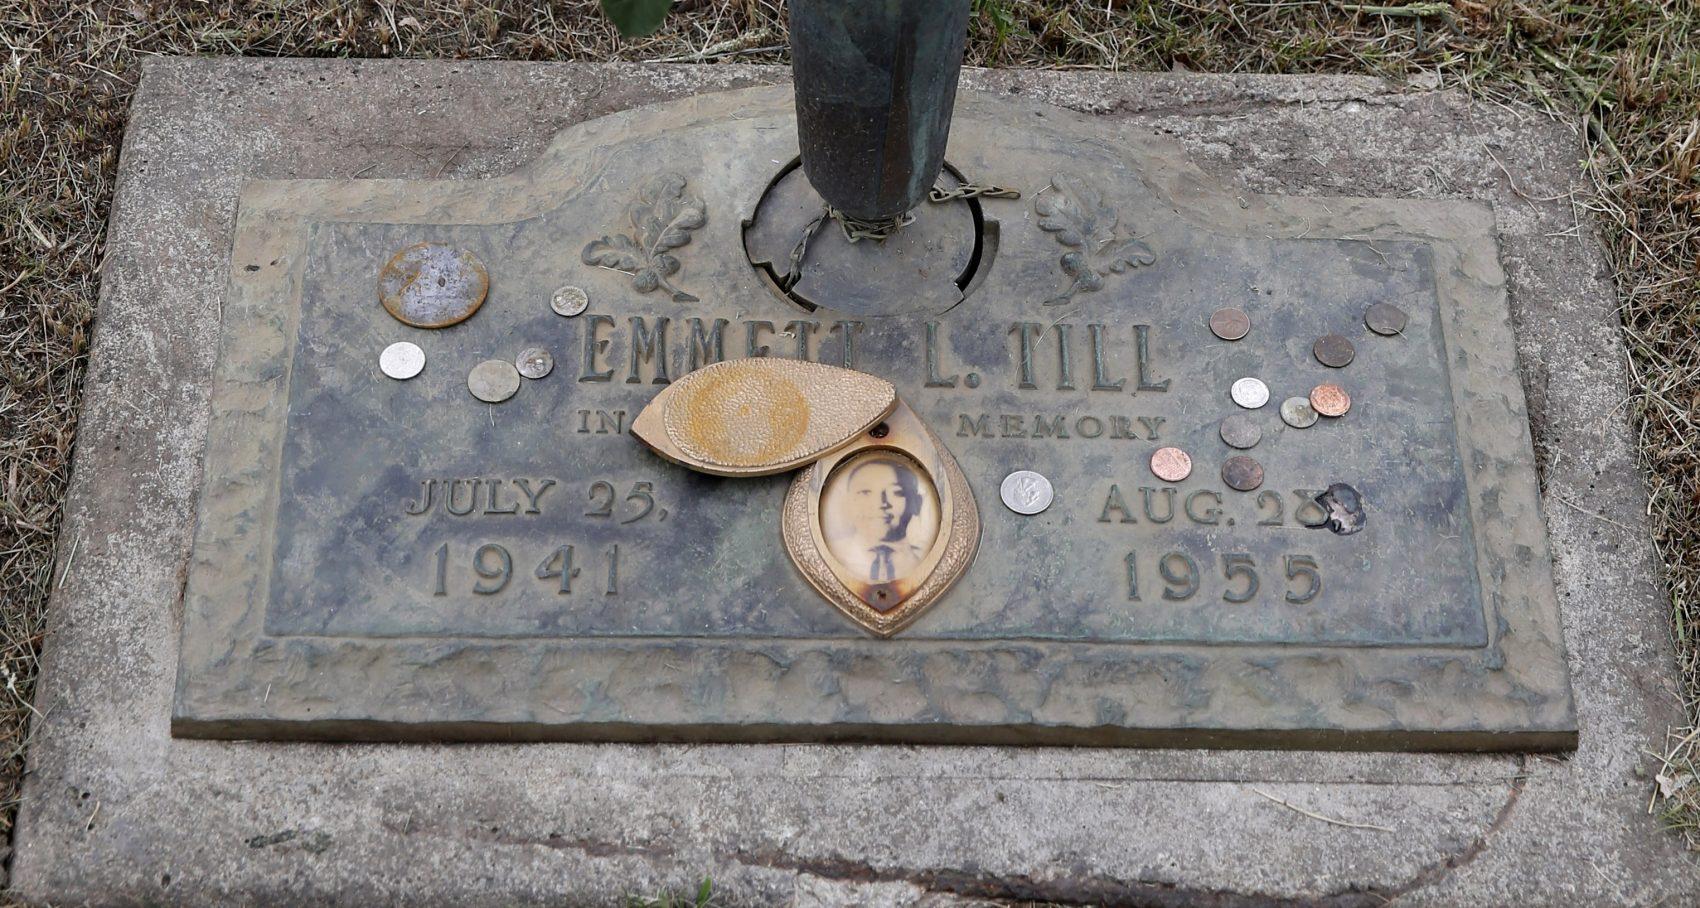 Reopening The Case Of Emmett Till | Iowa Public Radio